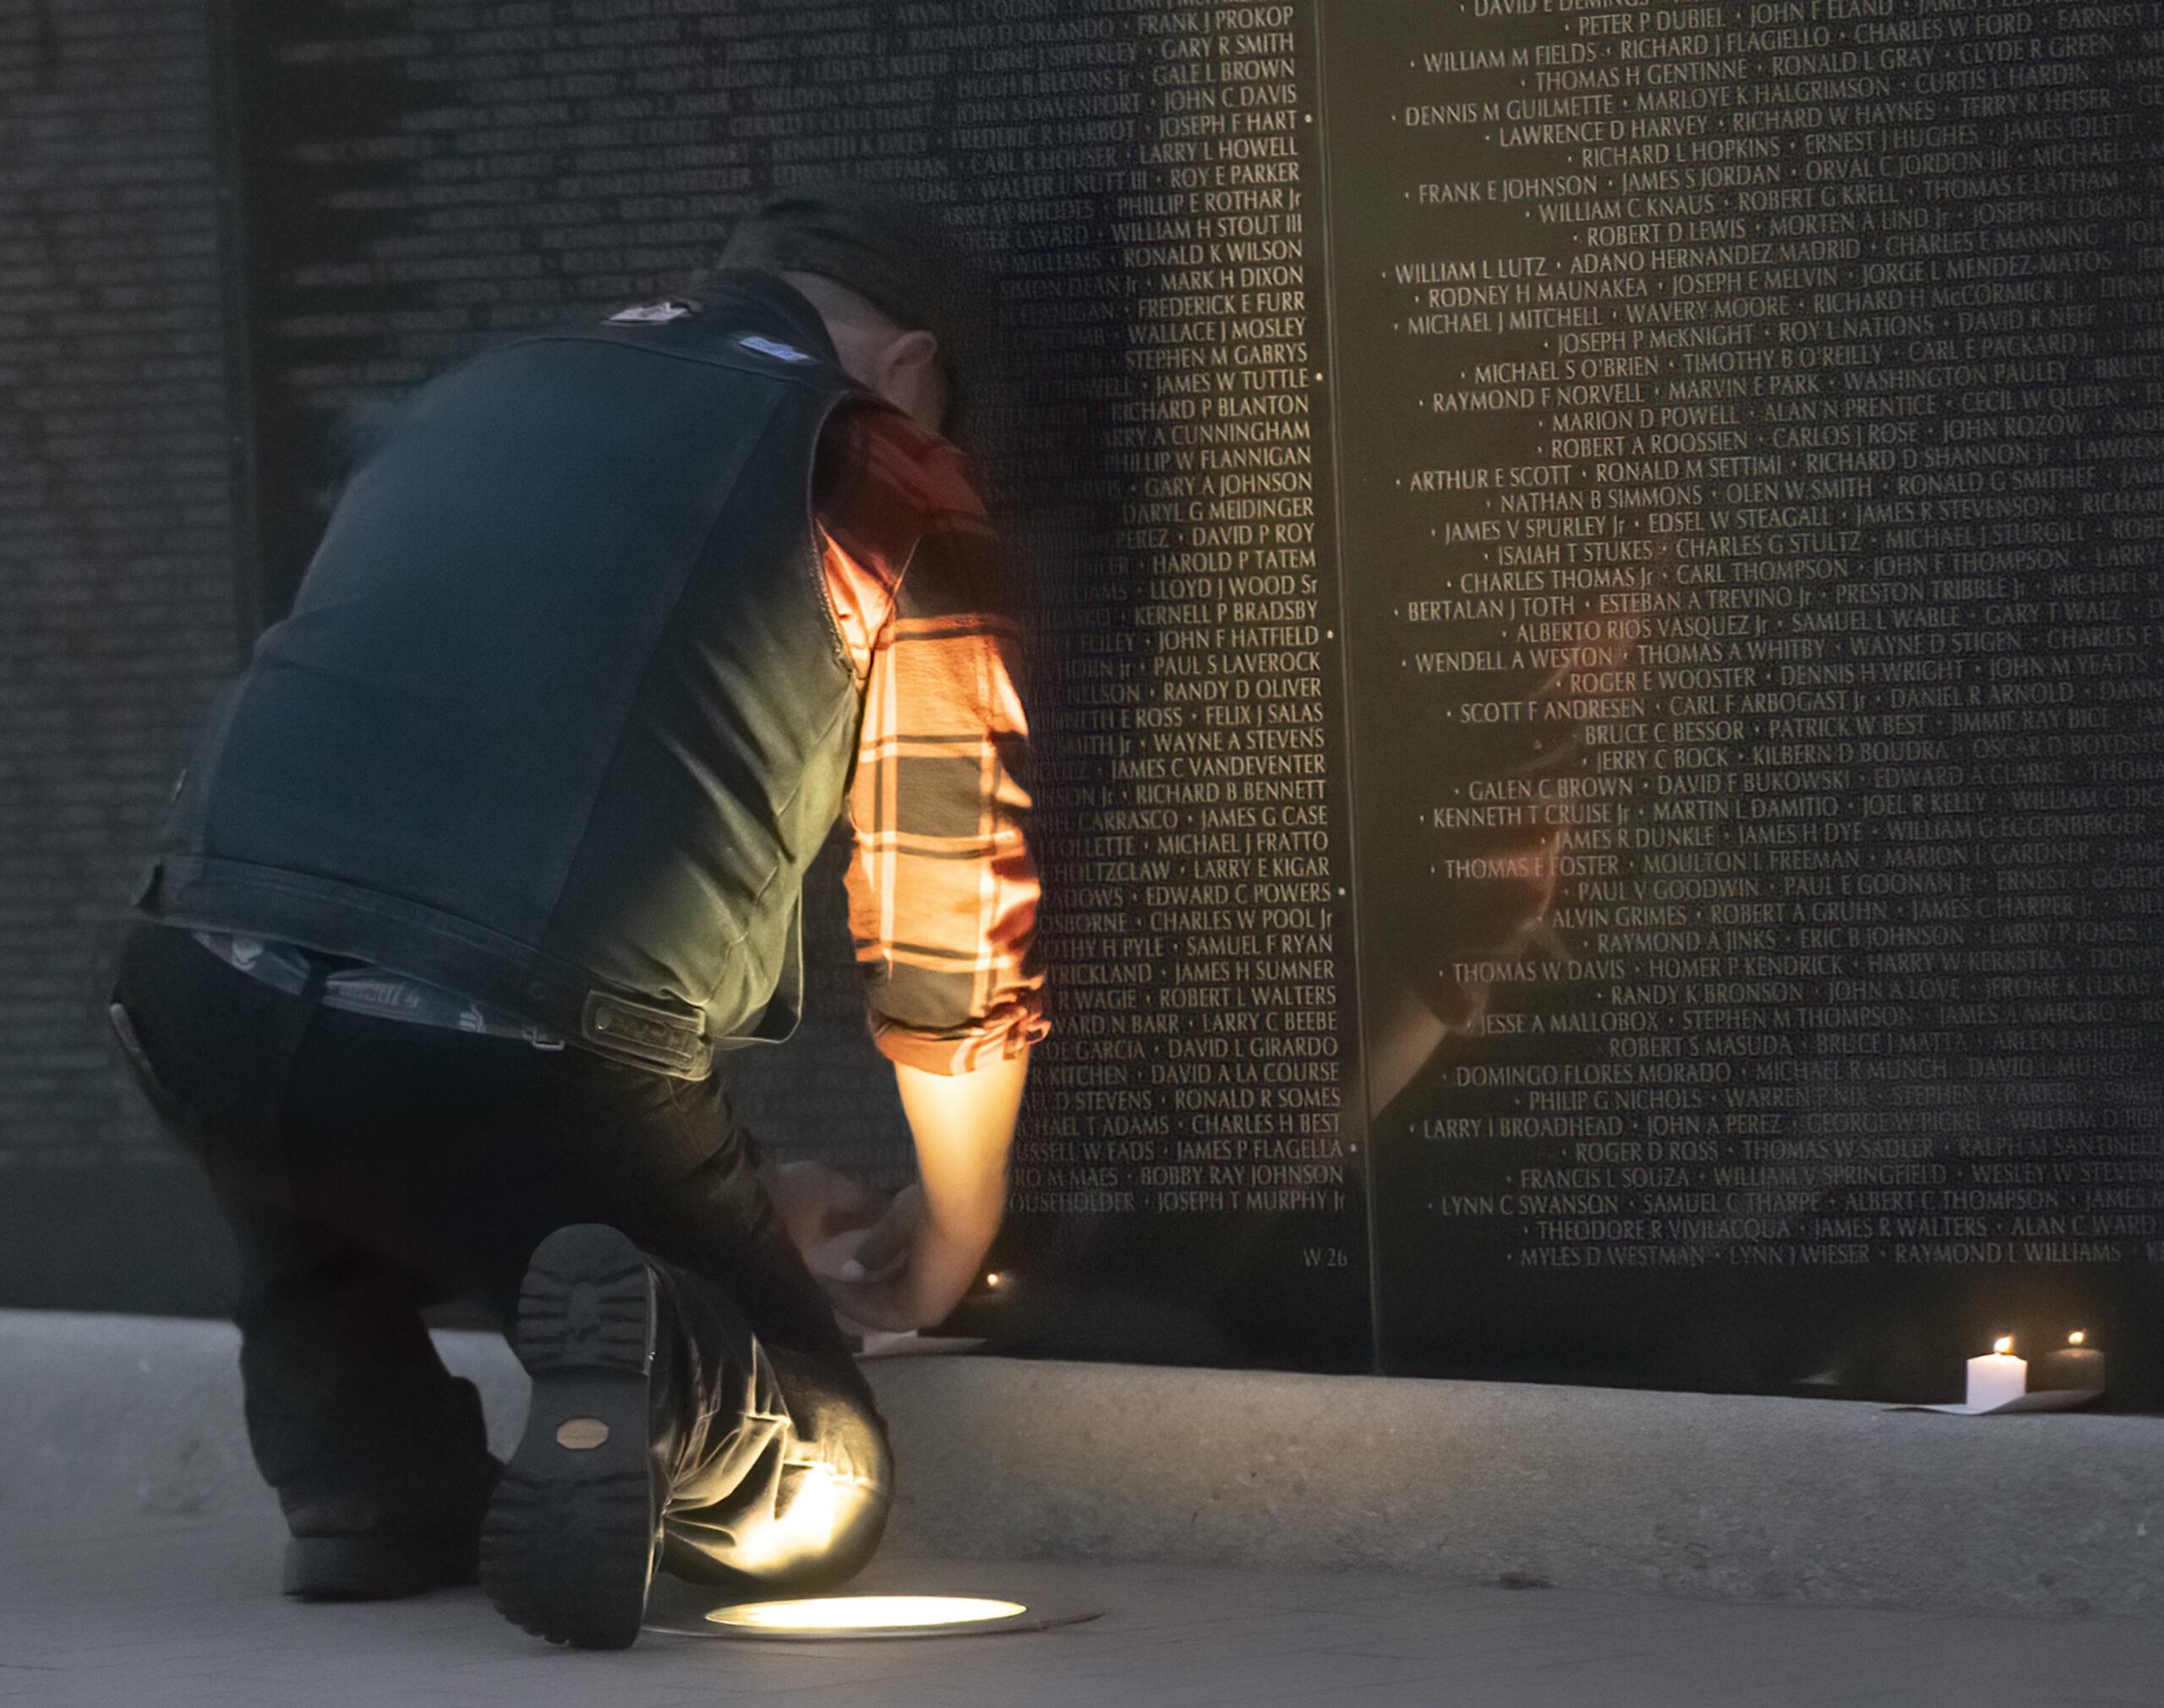 Kneeling at the Candle Light Vigil